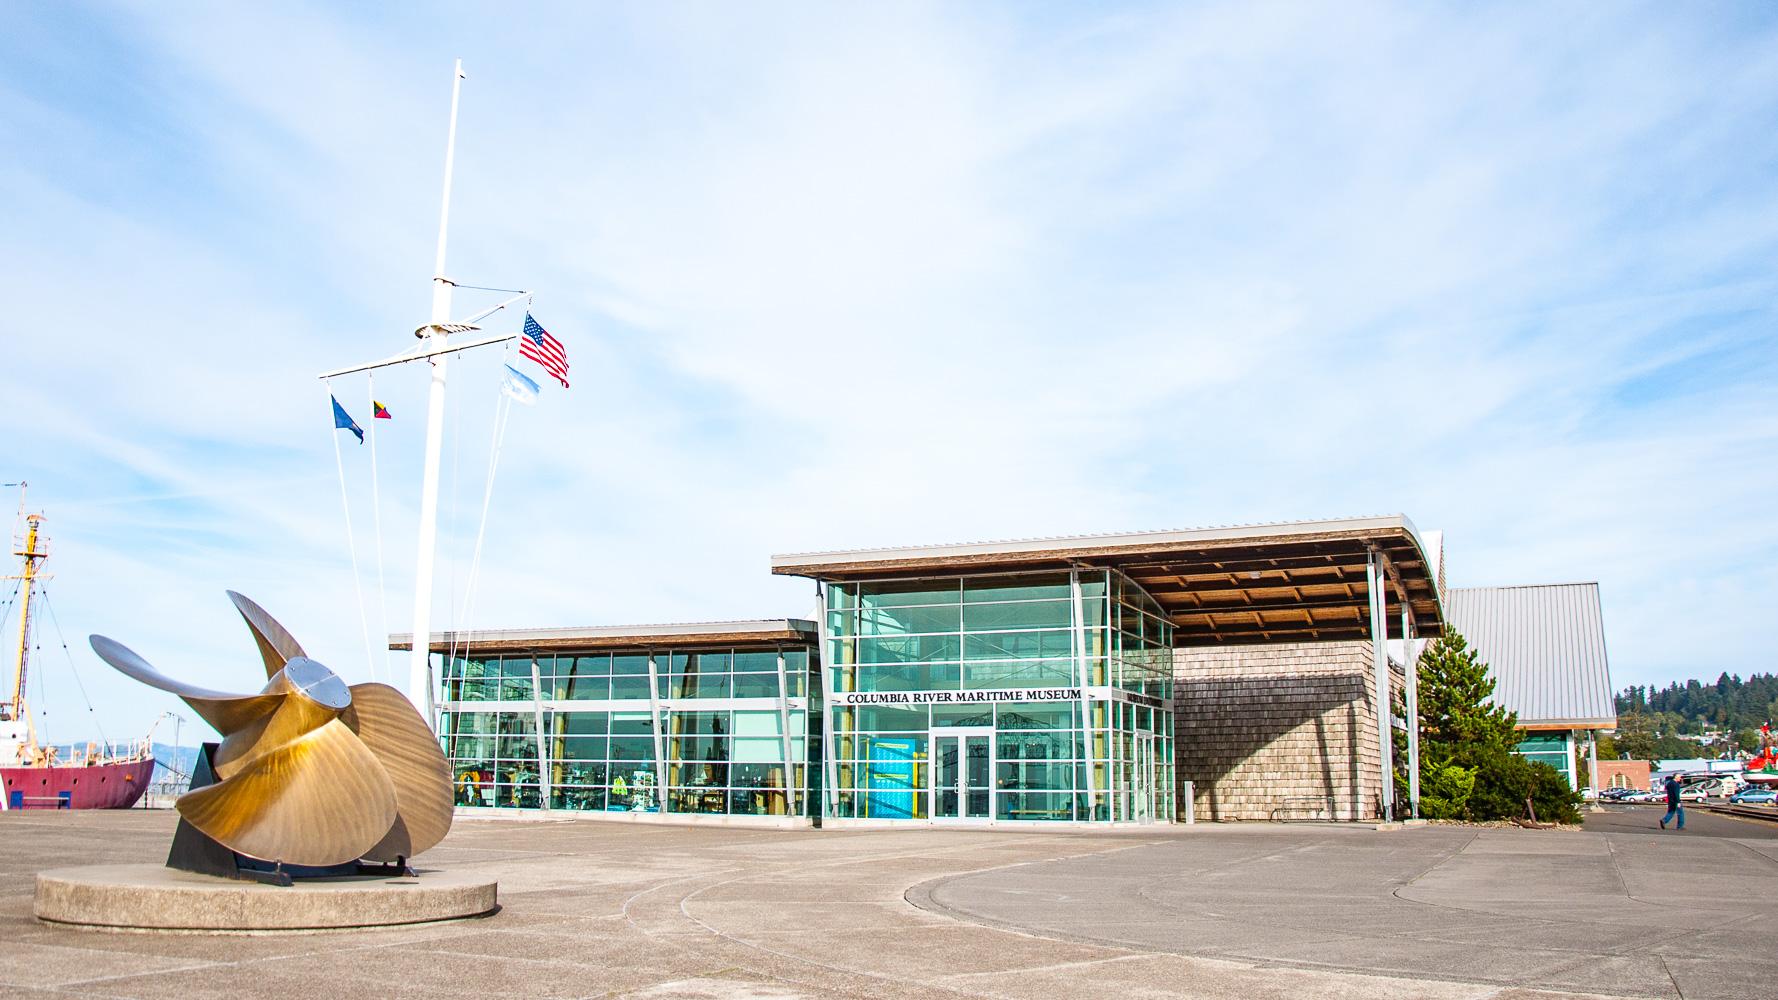 Columbia River Maritime Museum, Astoria, Oregon